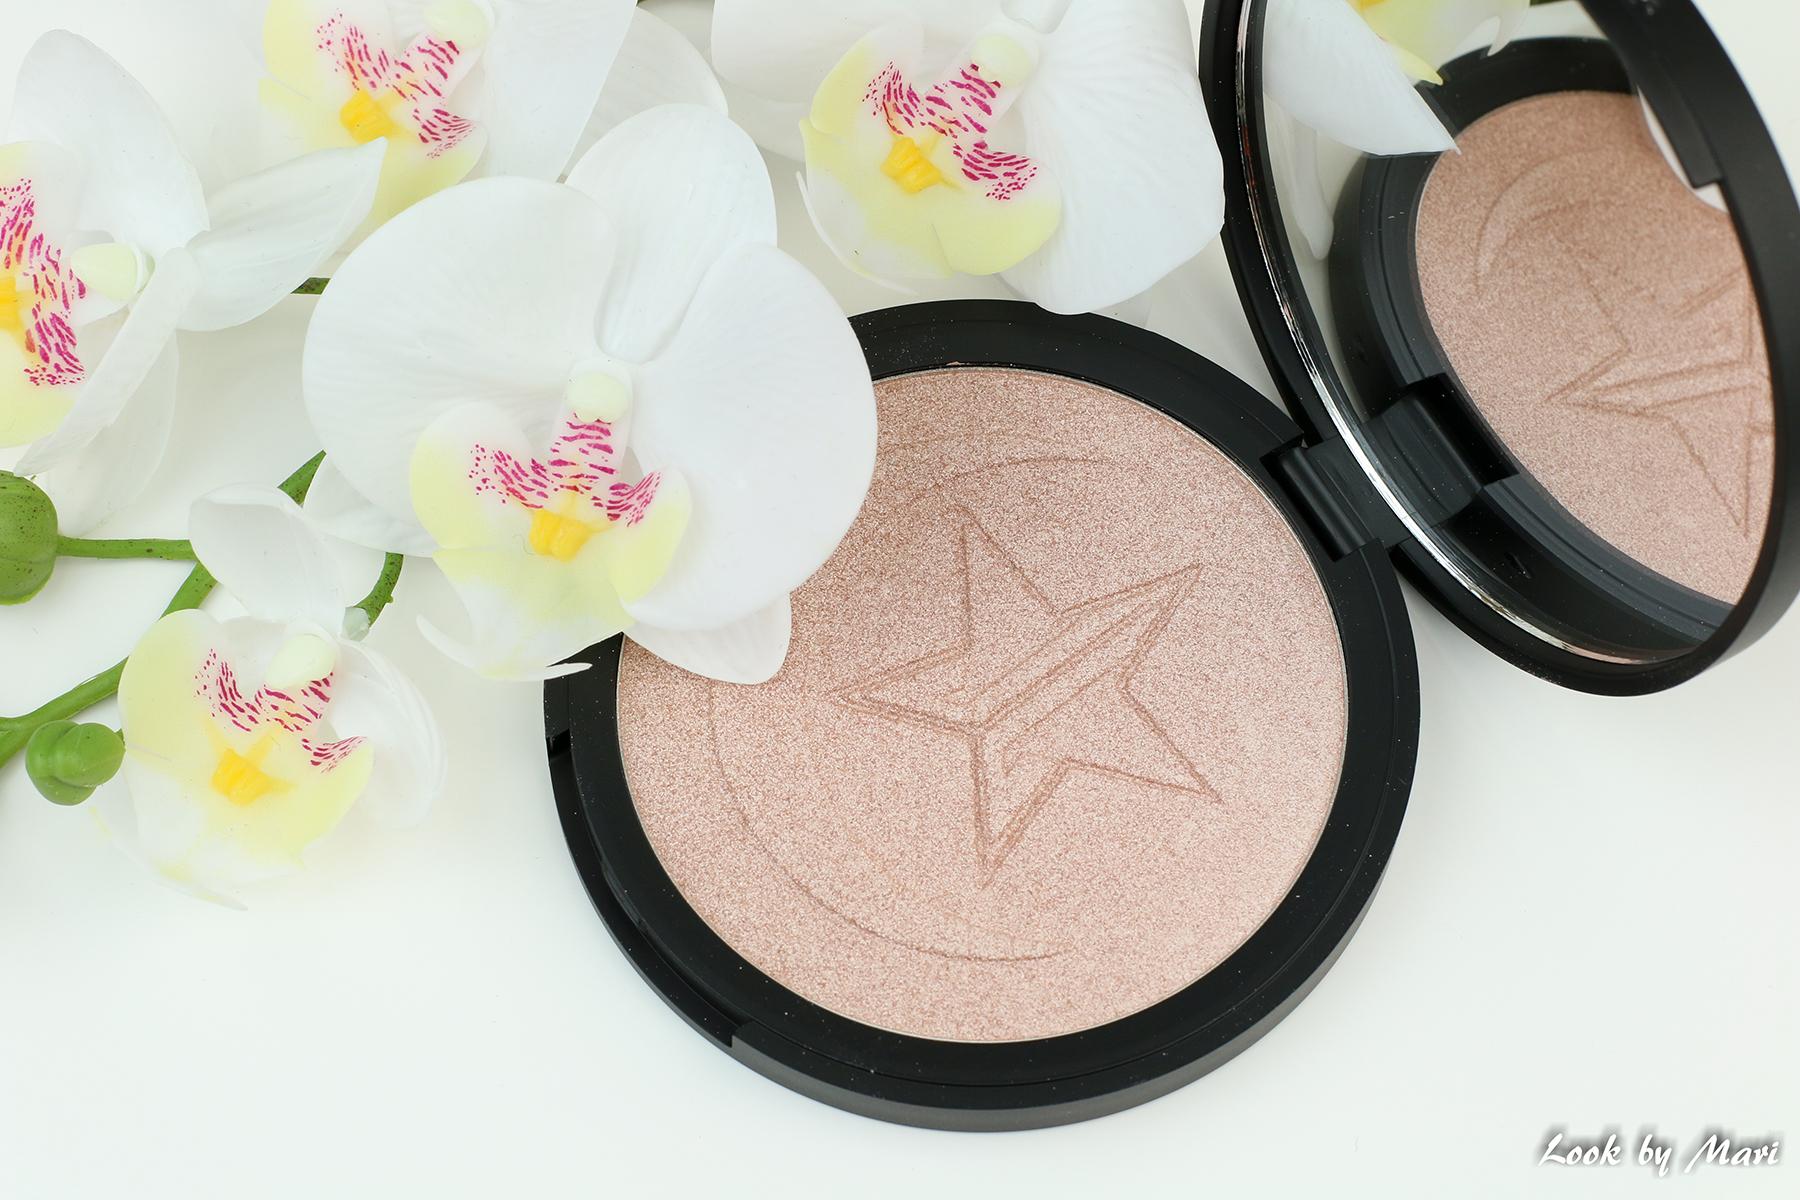 11 oletkaunis.fi jeffree star cosmetics kokemuksia skin frost eclipse manny mua